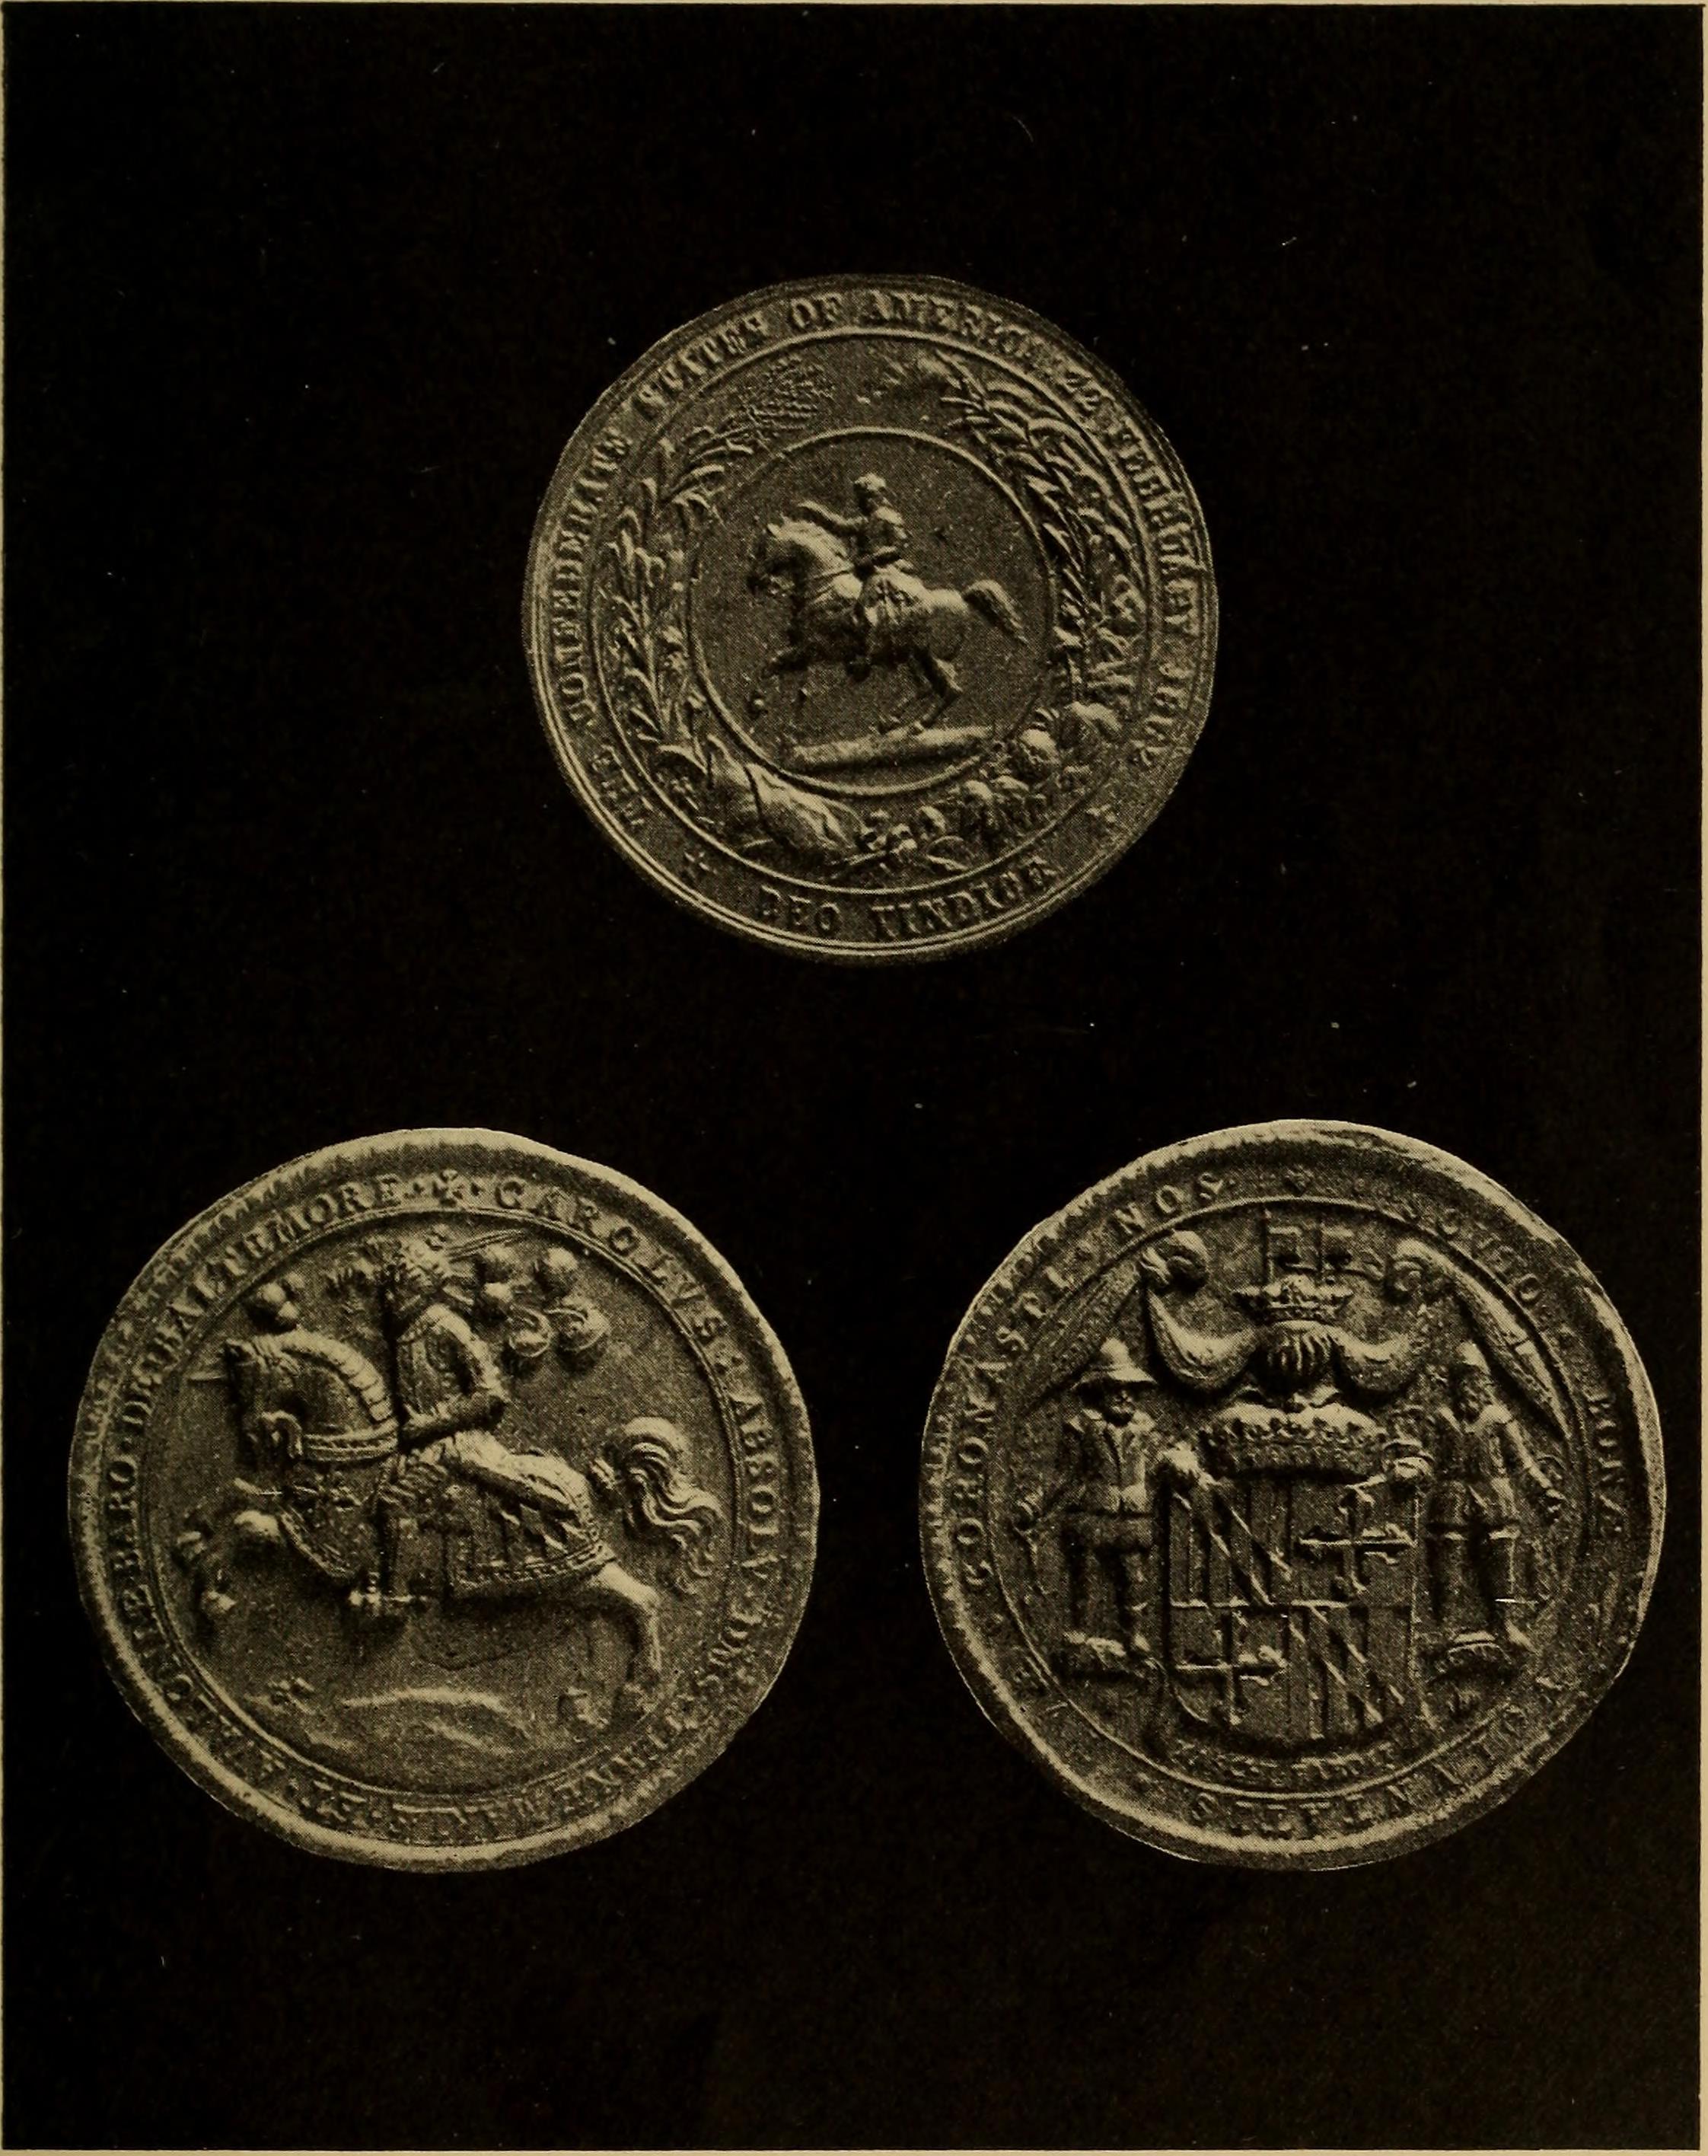 Three Great Seals of England